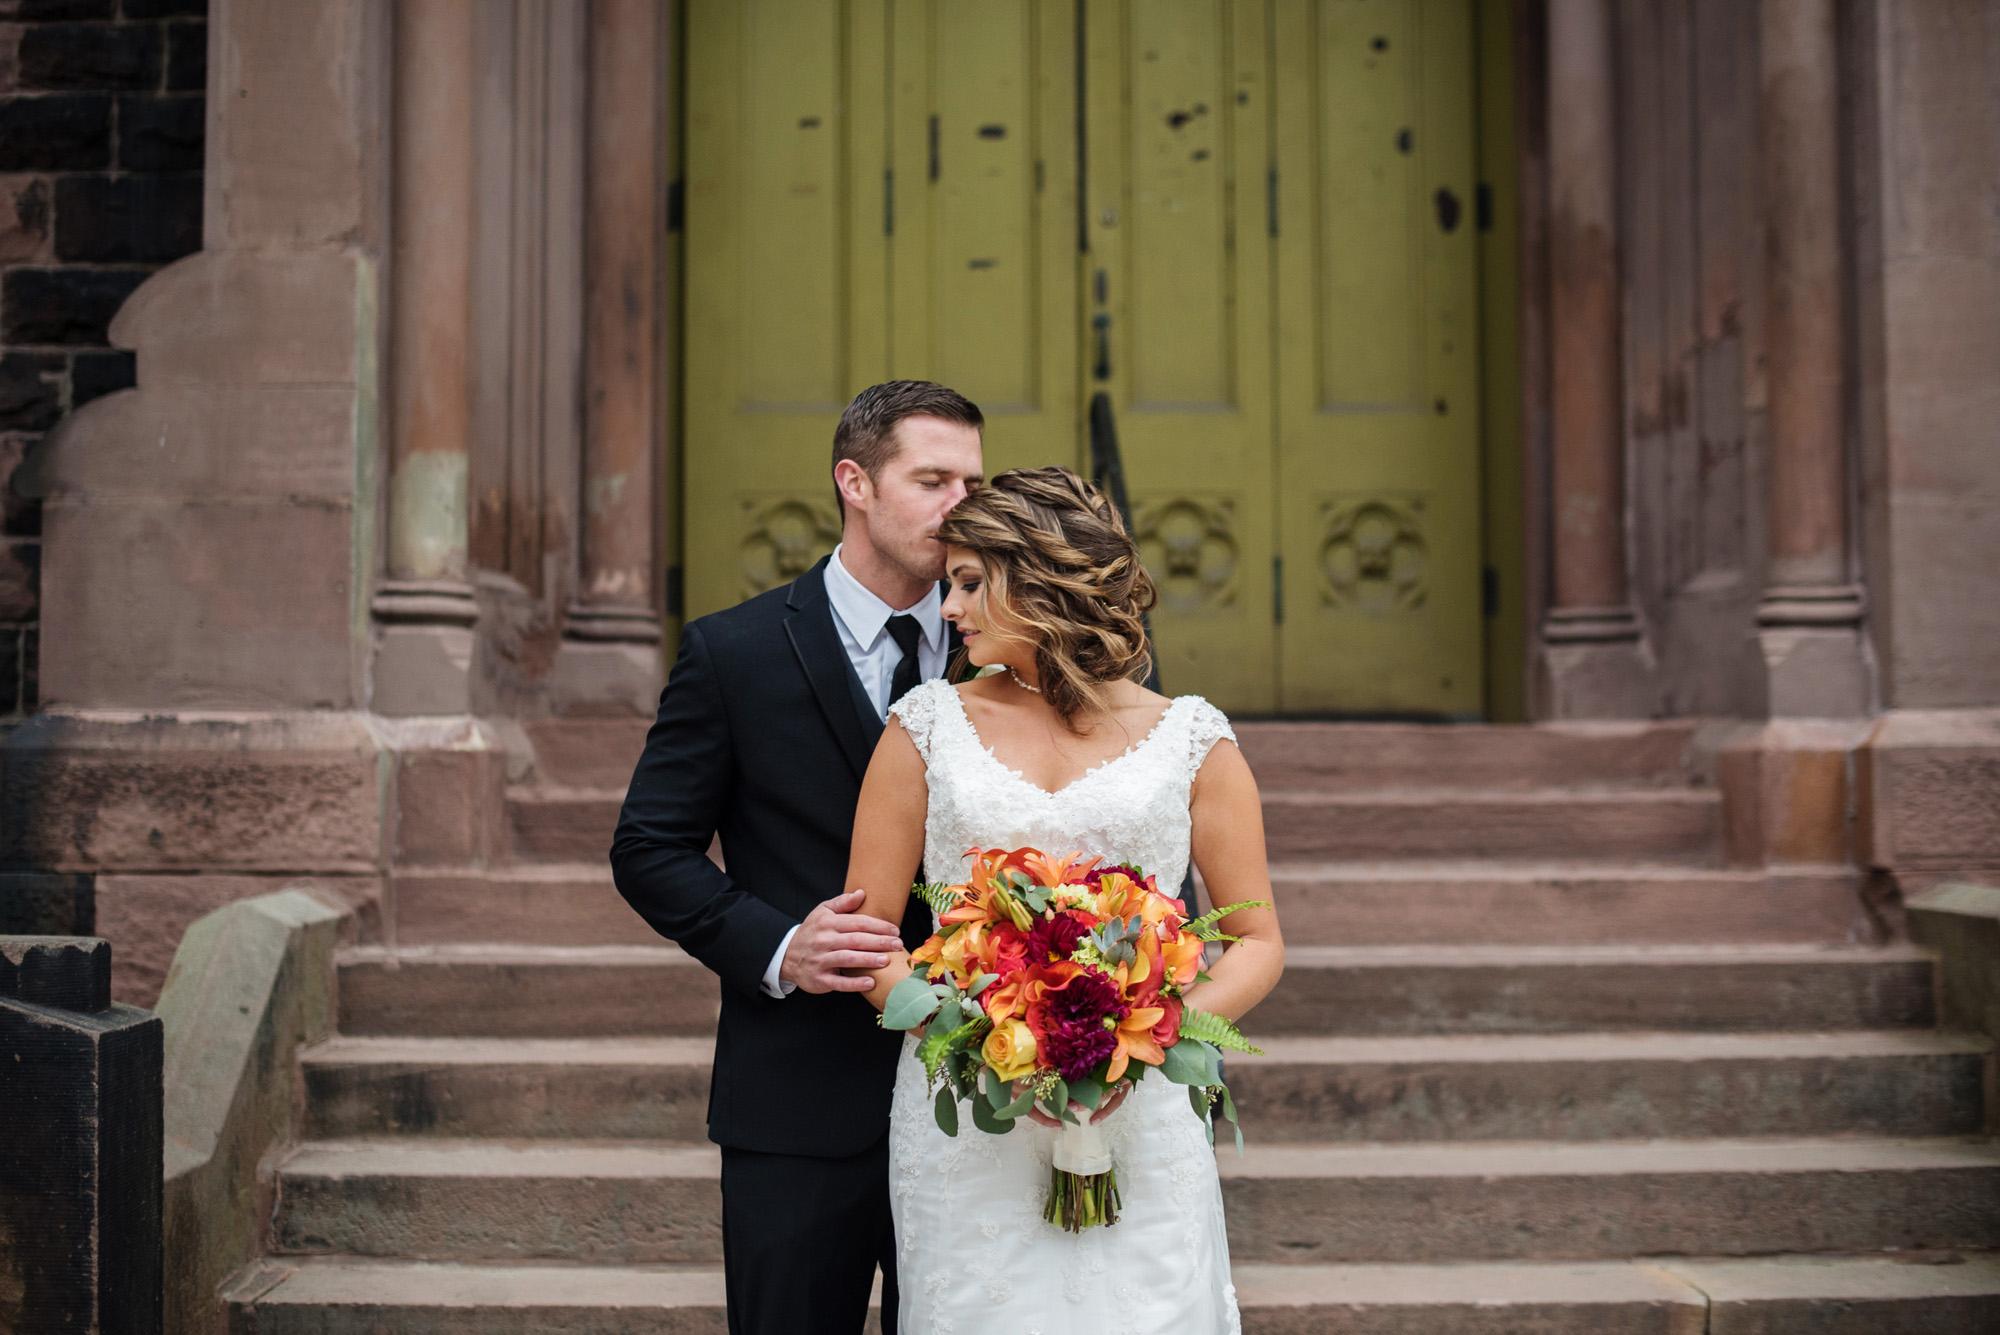 Chris Emma got married-Wedding Party Fun-0128.jpg